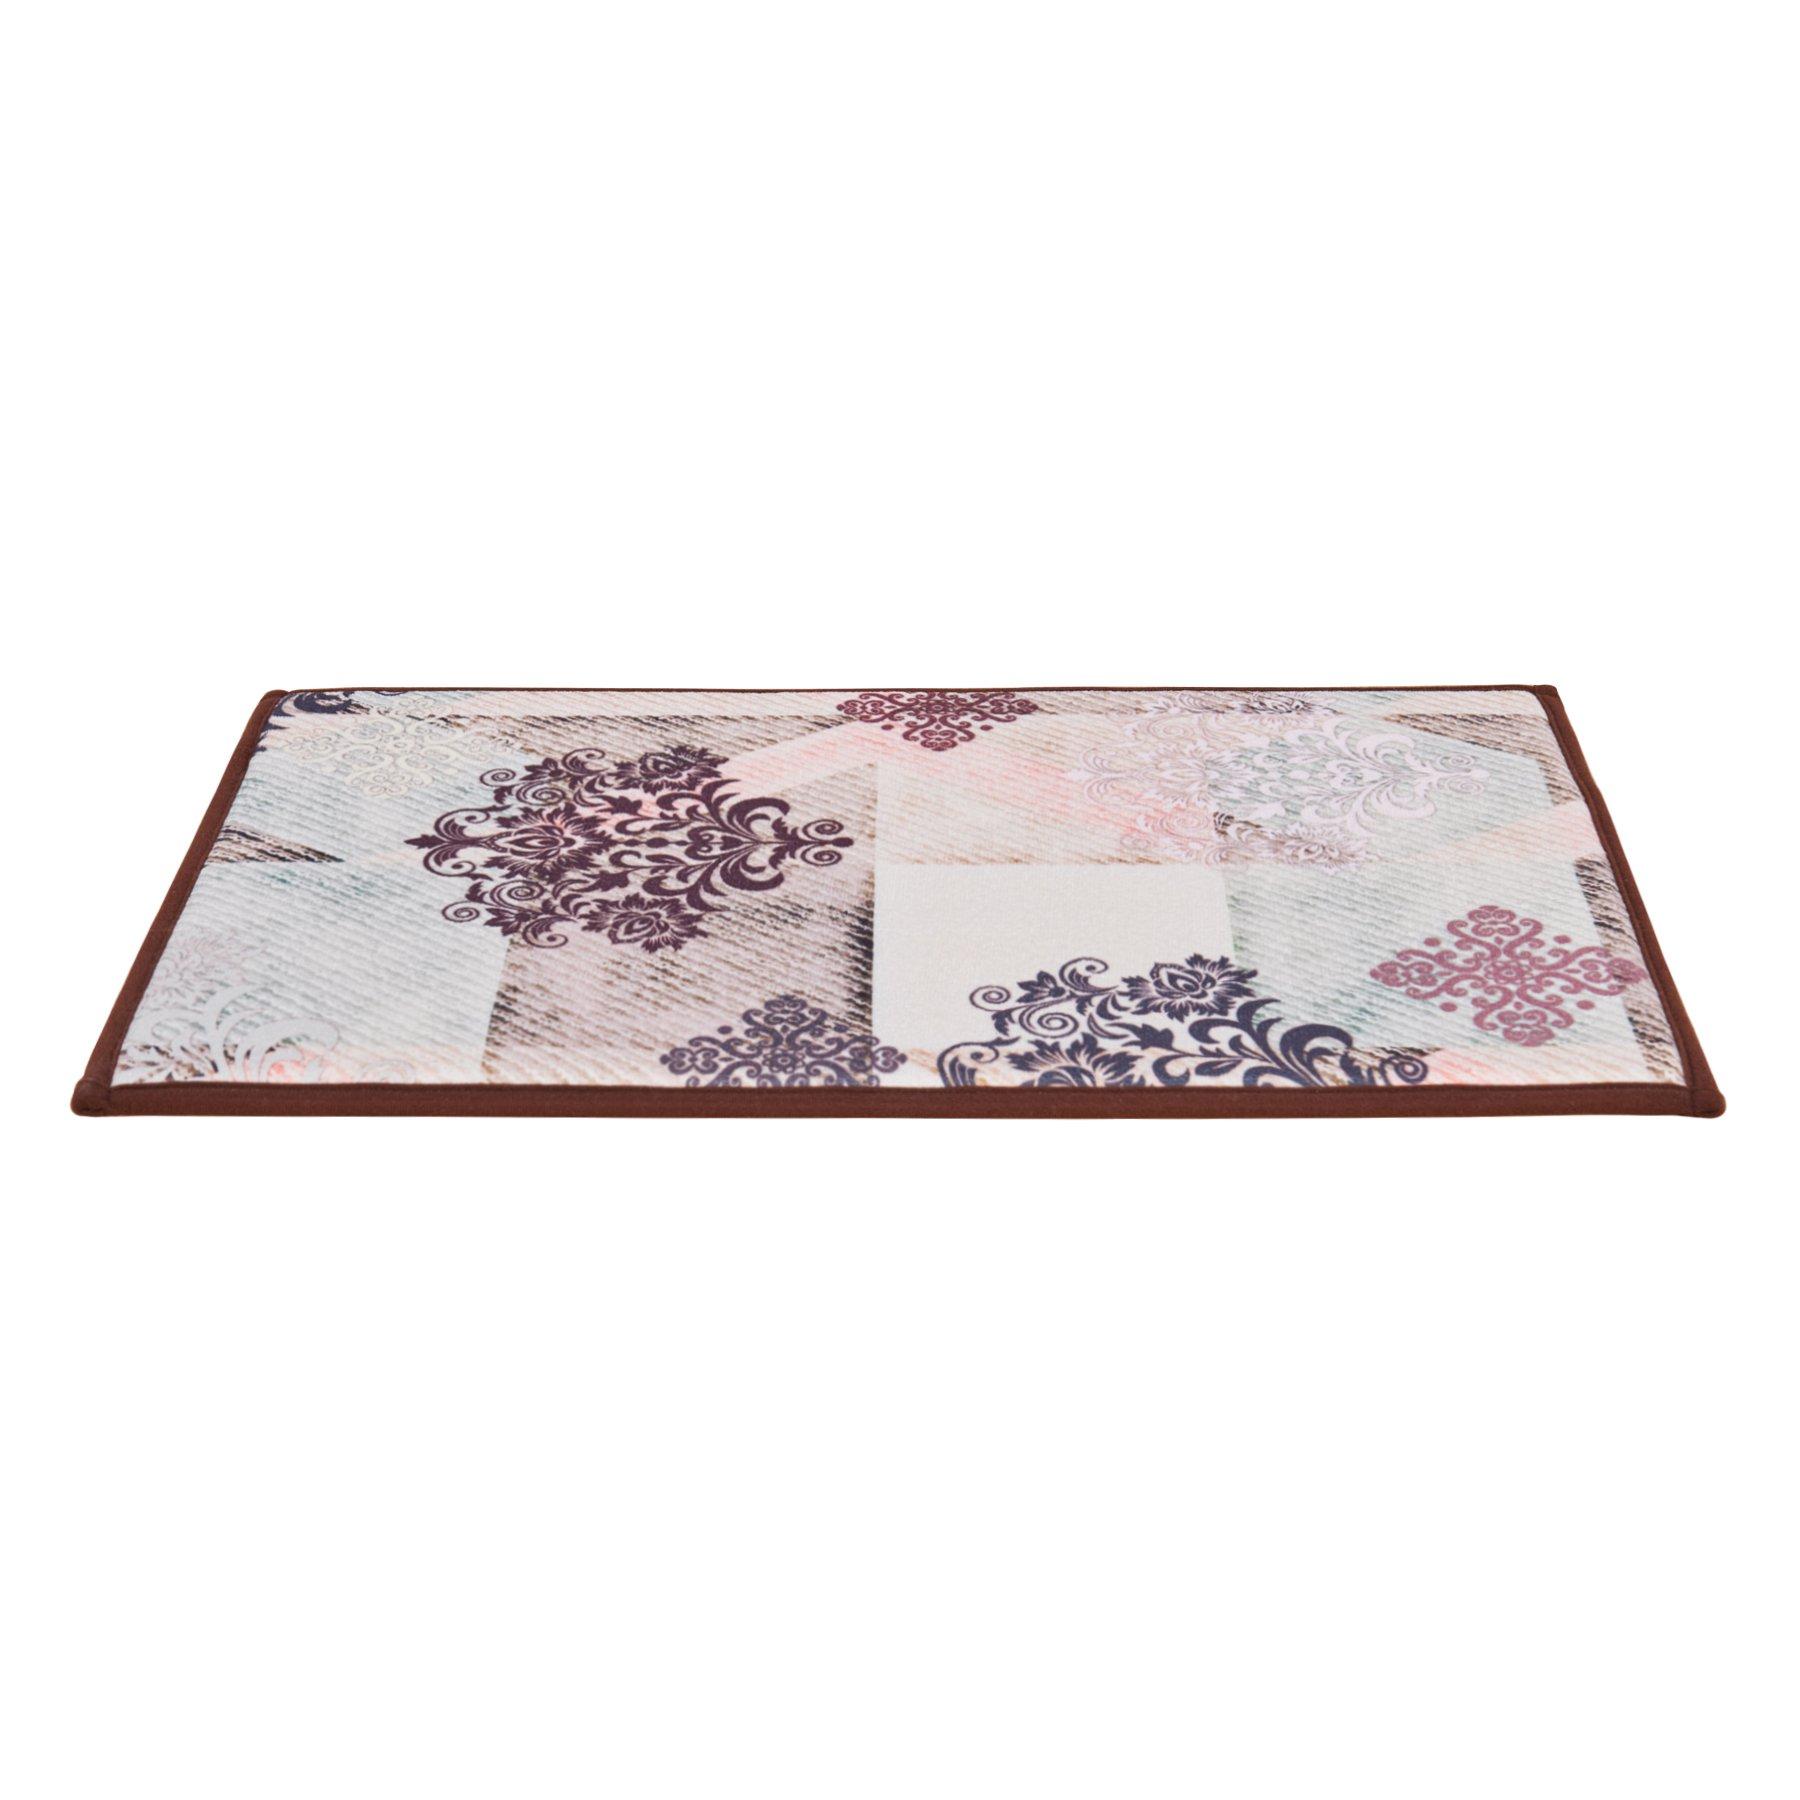 Absorbs Mud Indoor Outdoor Digital Printed Kitchen Dining Living Hallway Bathroom Doormat 18''x 30'' Shoes Scraper Entrance Rug Carpet (18''x 30'', Style 3) by CHUN YI